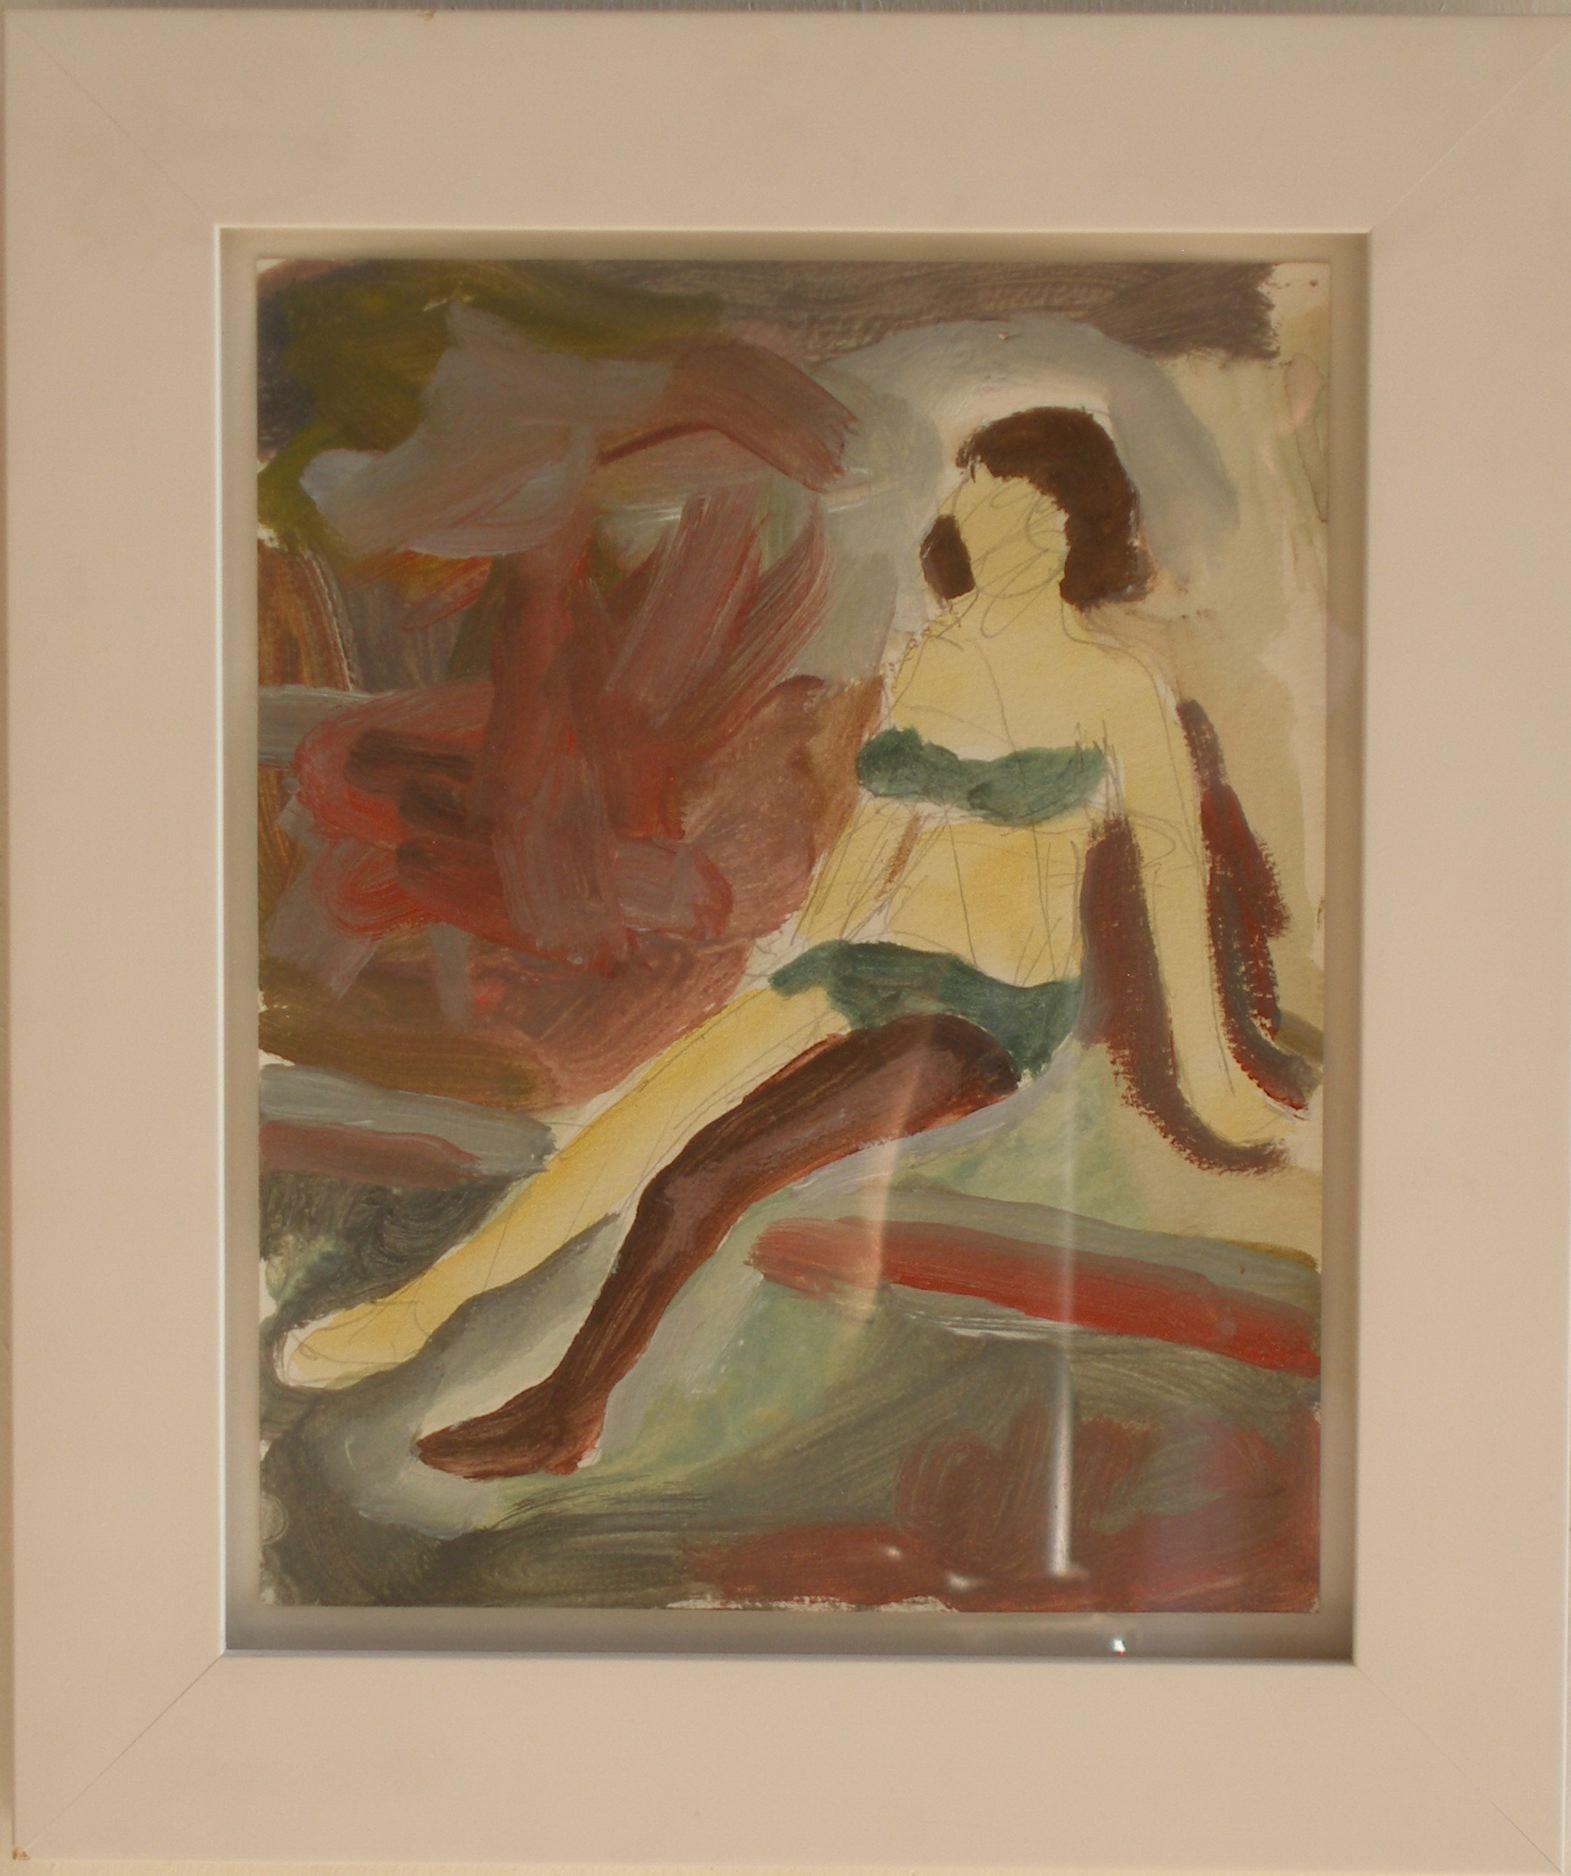 SIMON BLAU Dark Leg / Light Leg 2004 acrylic on paper 25 × 19.7 cm